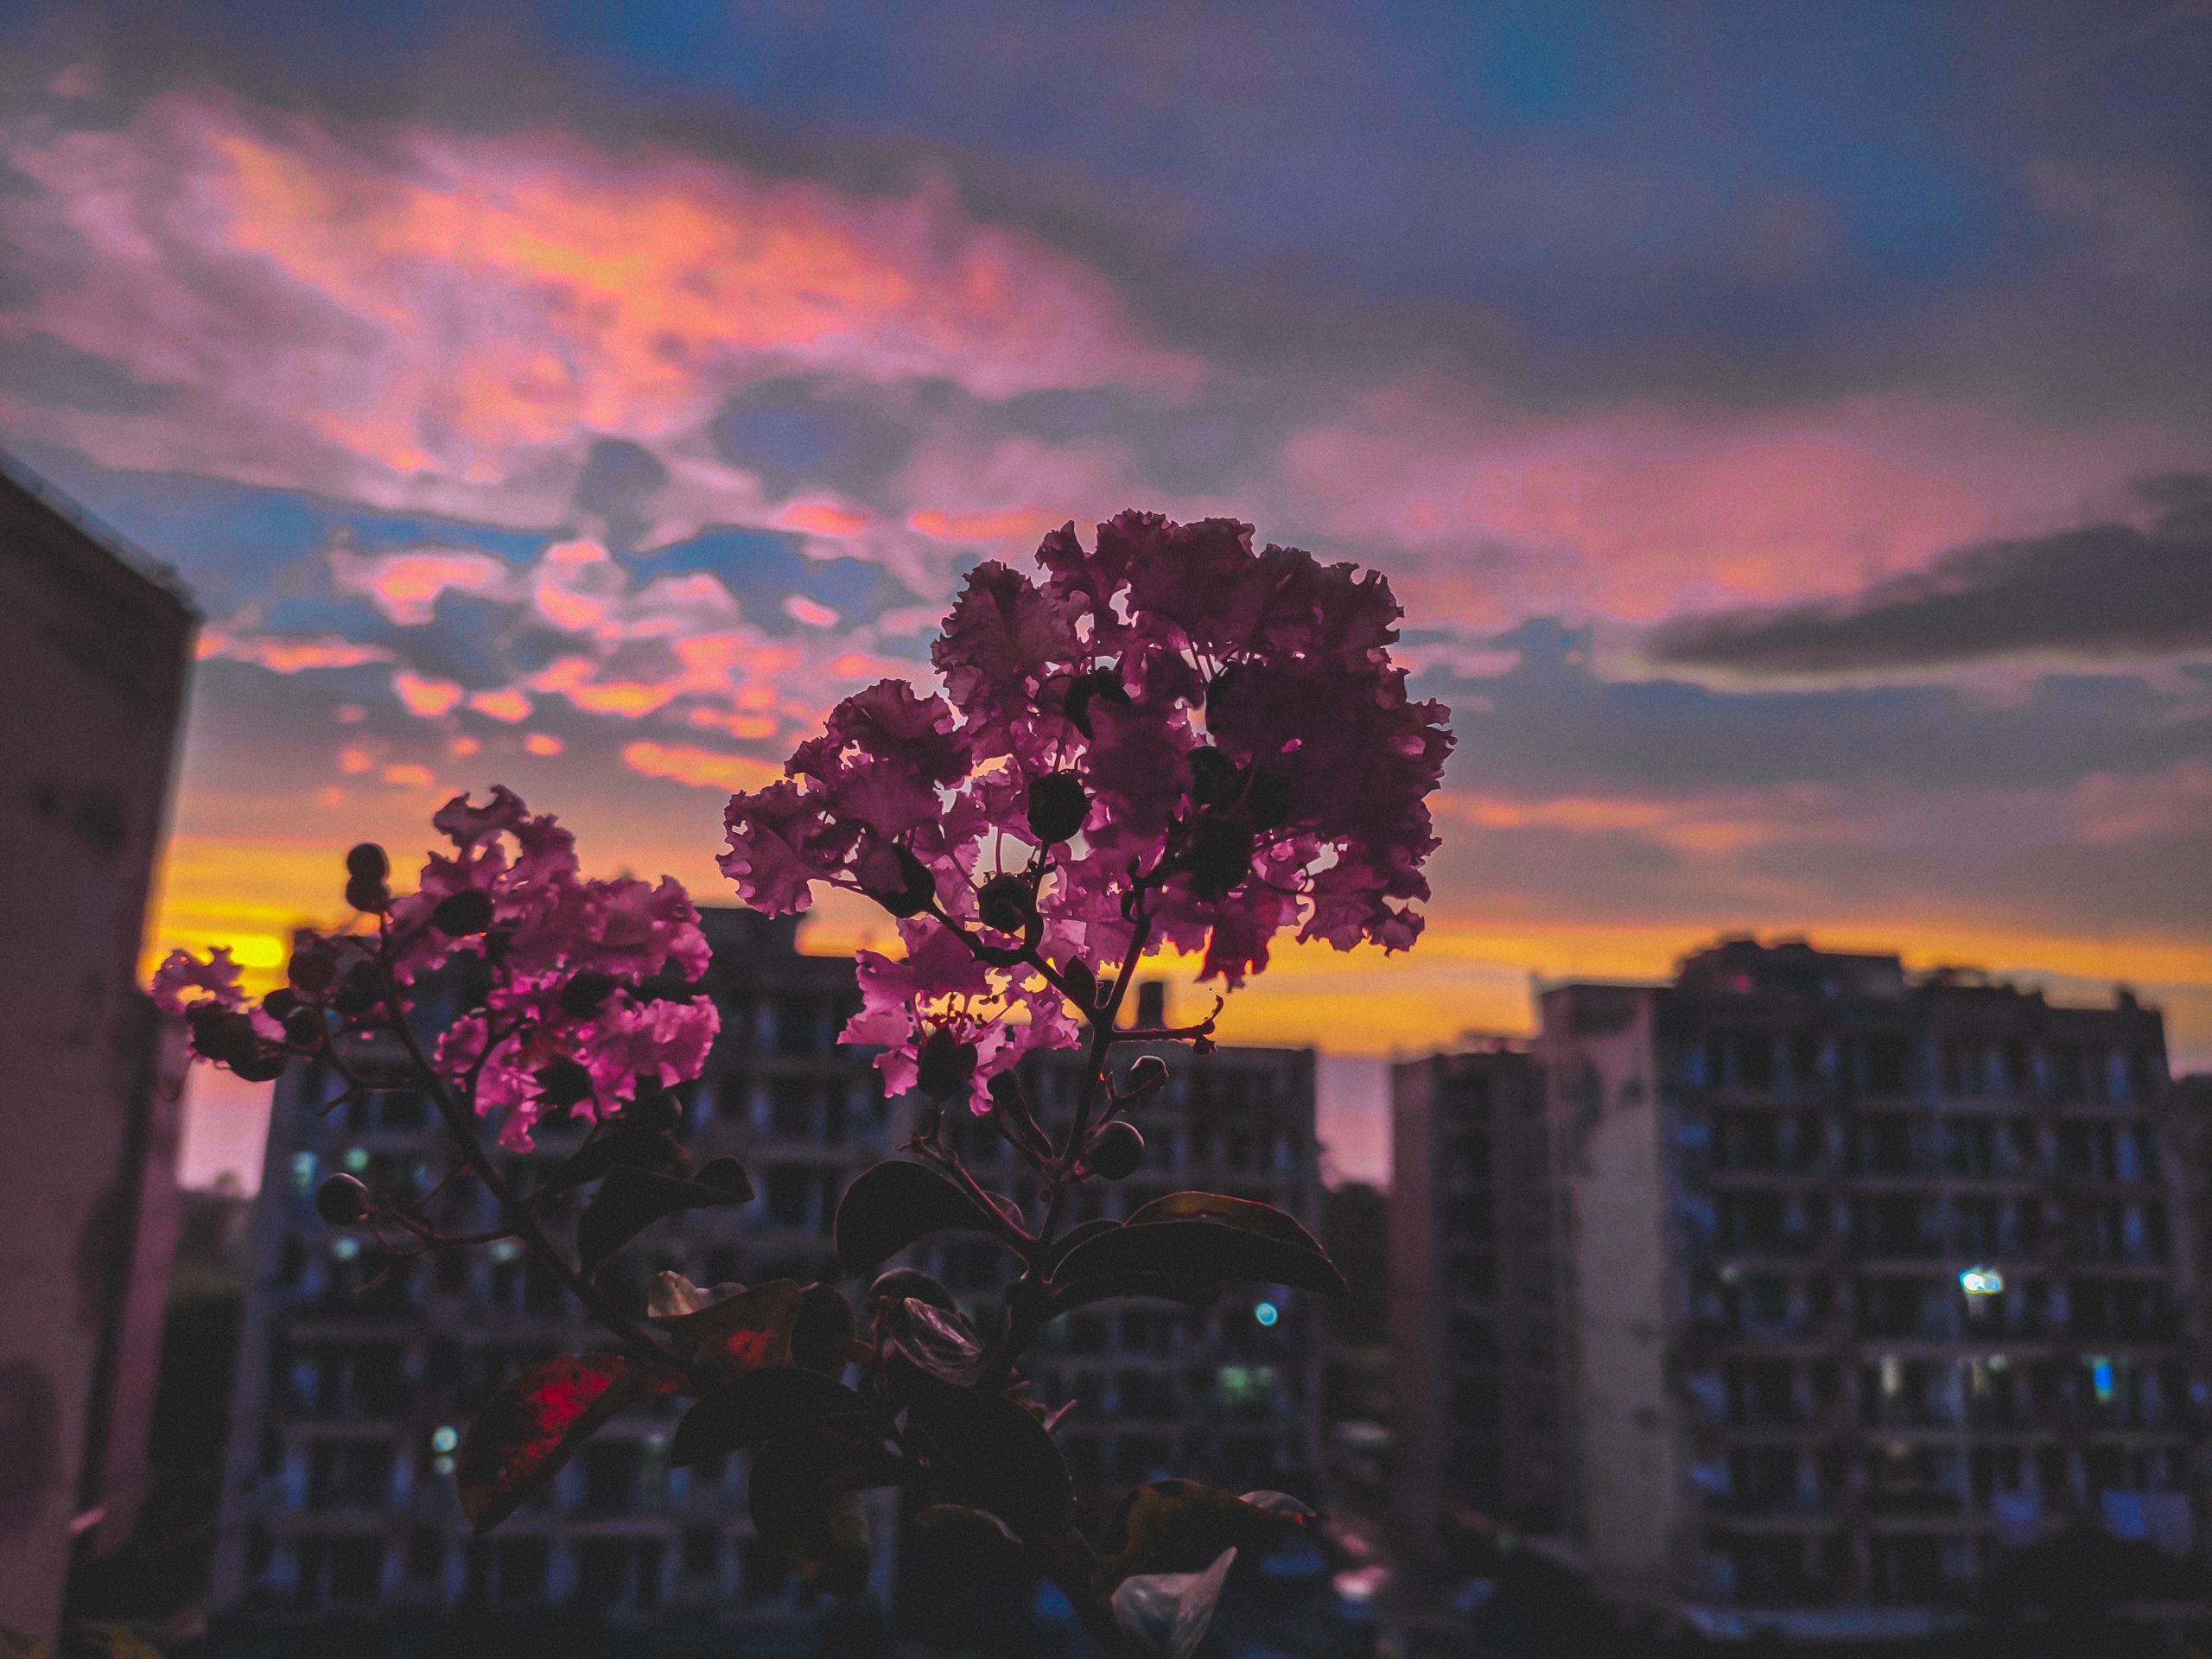 Flower pot and evening